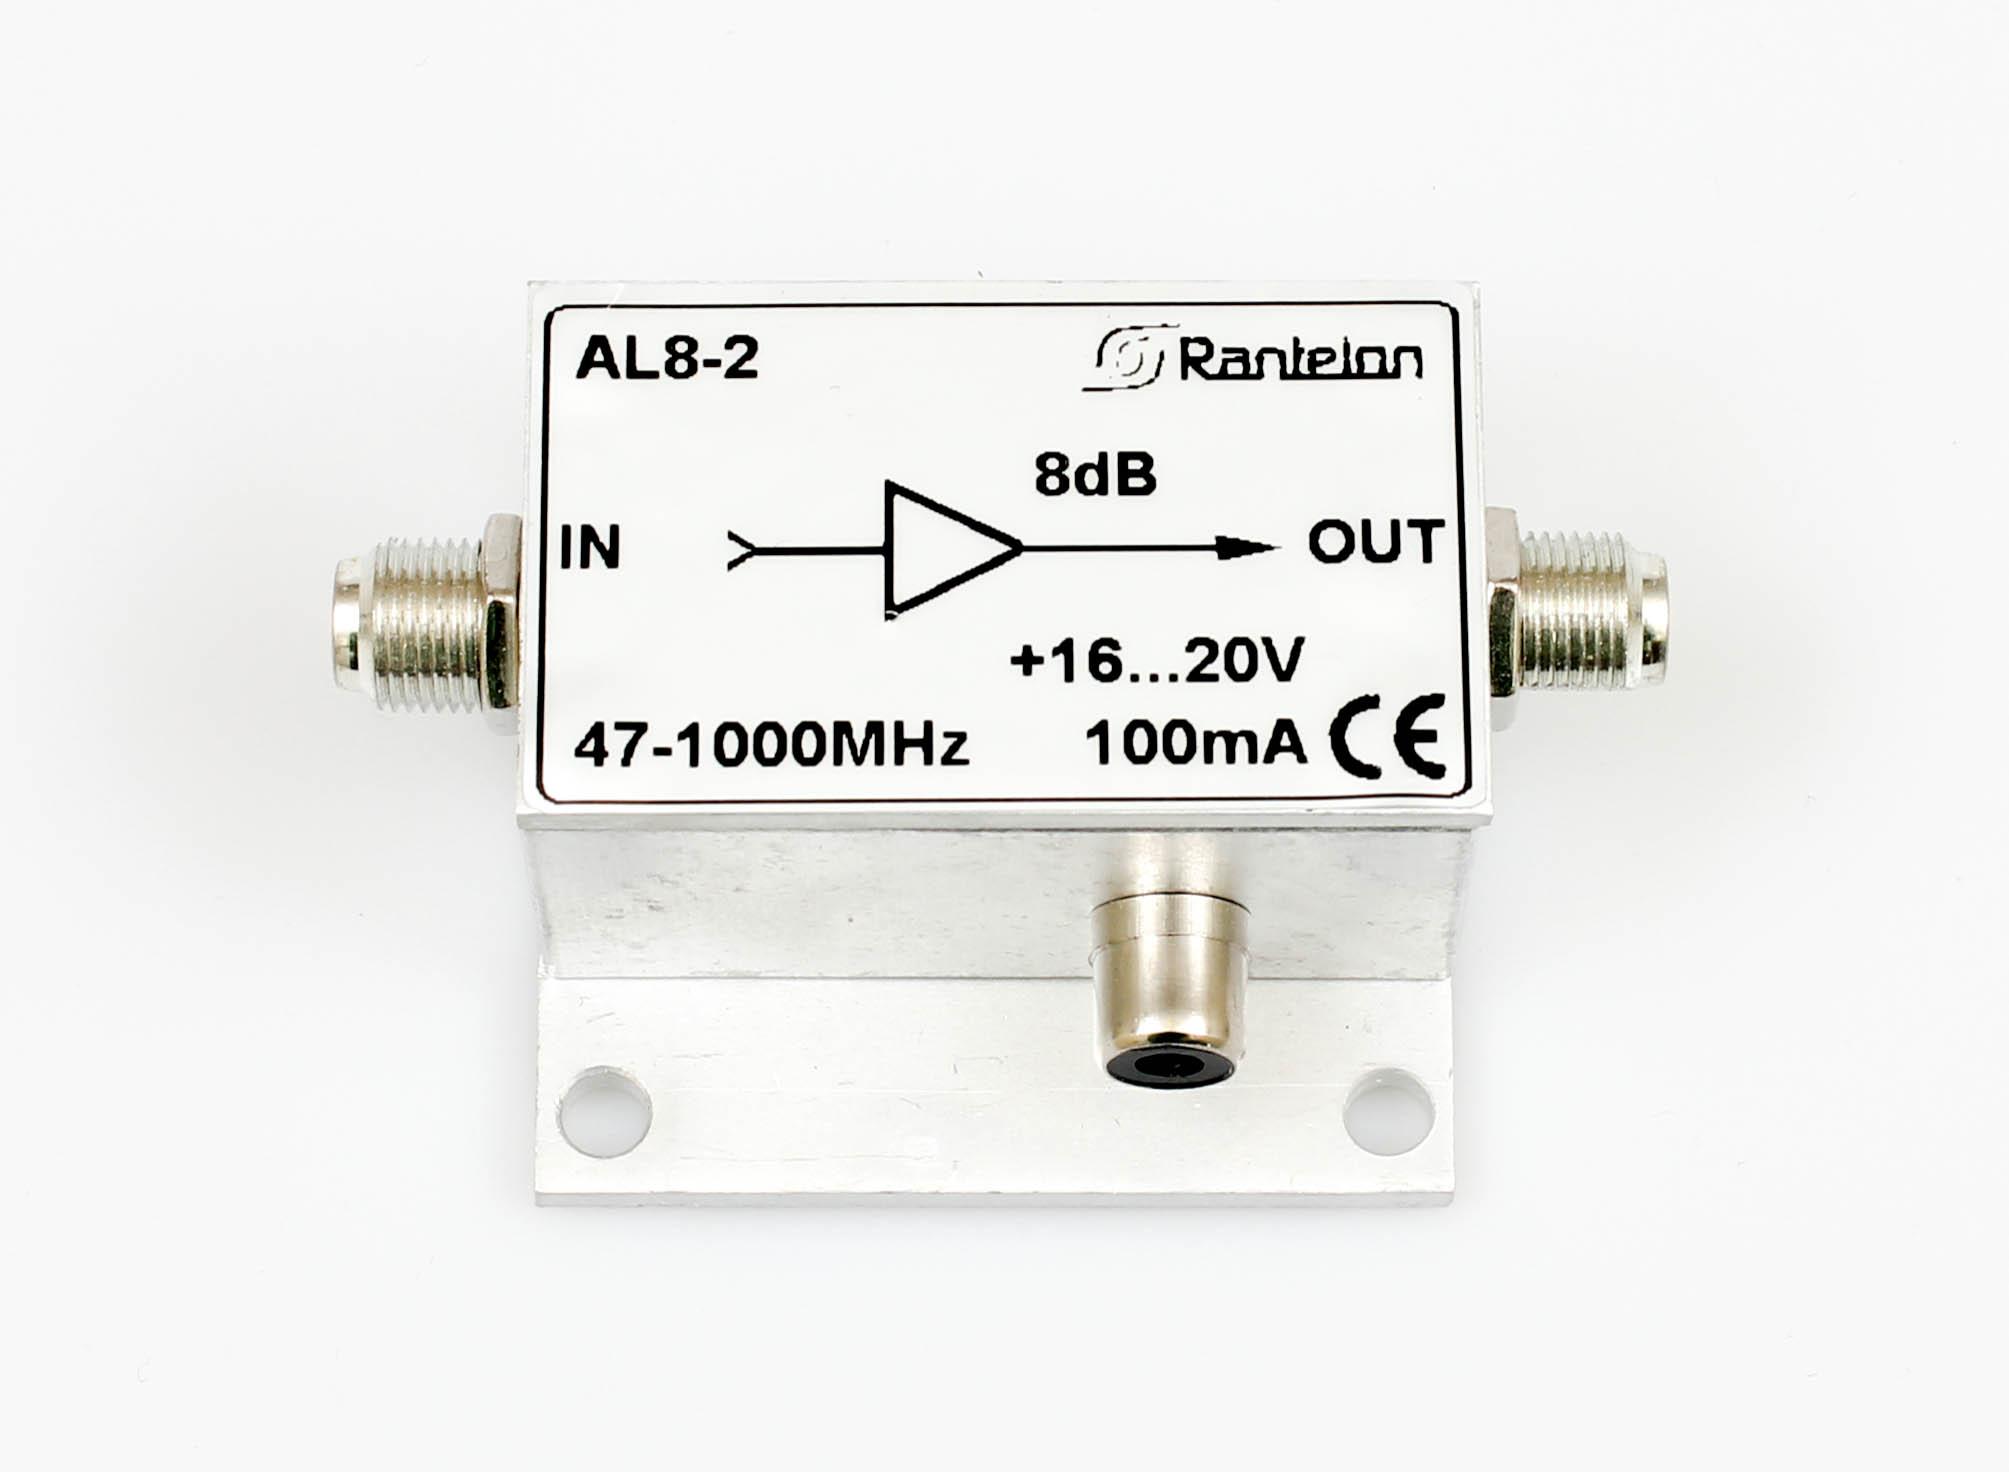 AL08-2